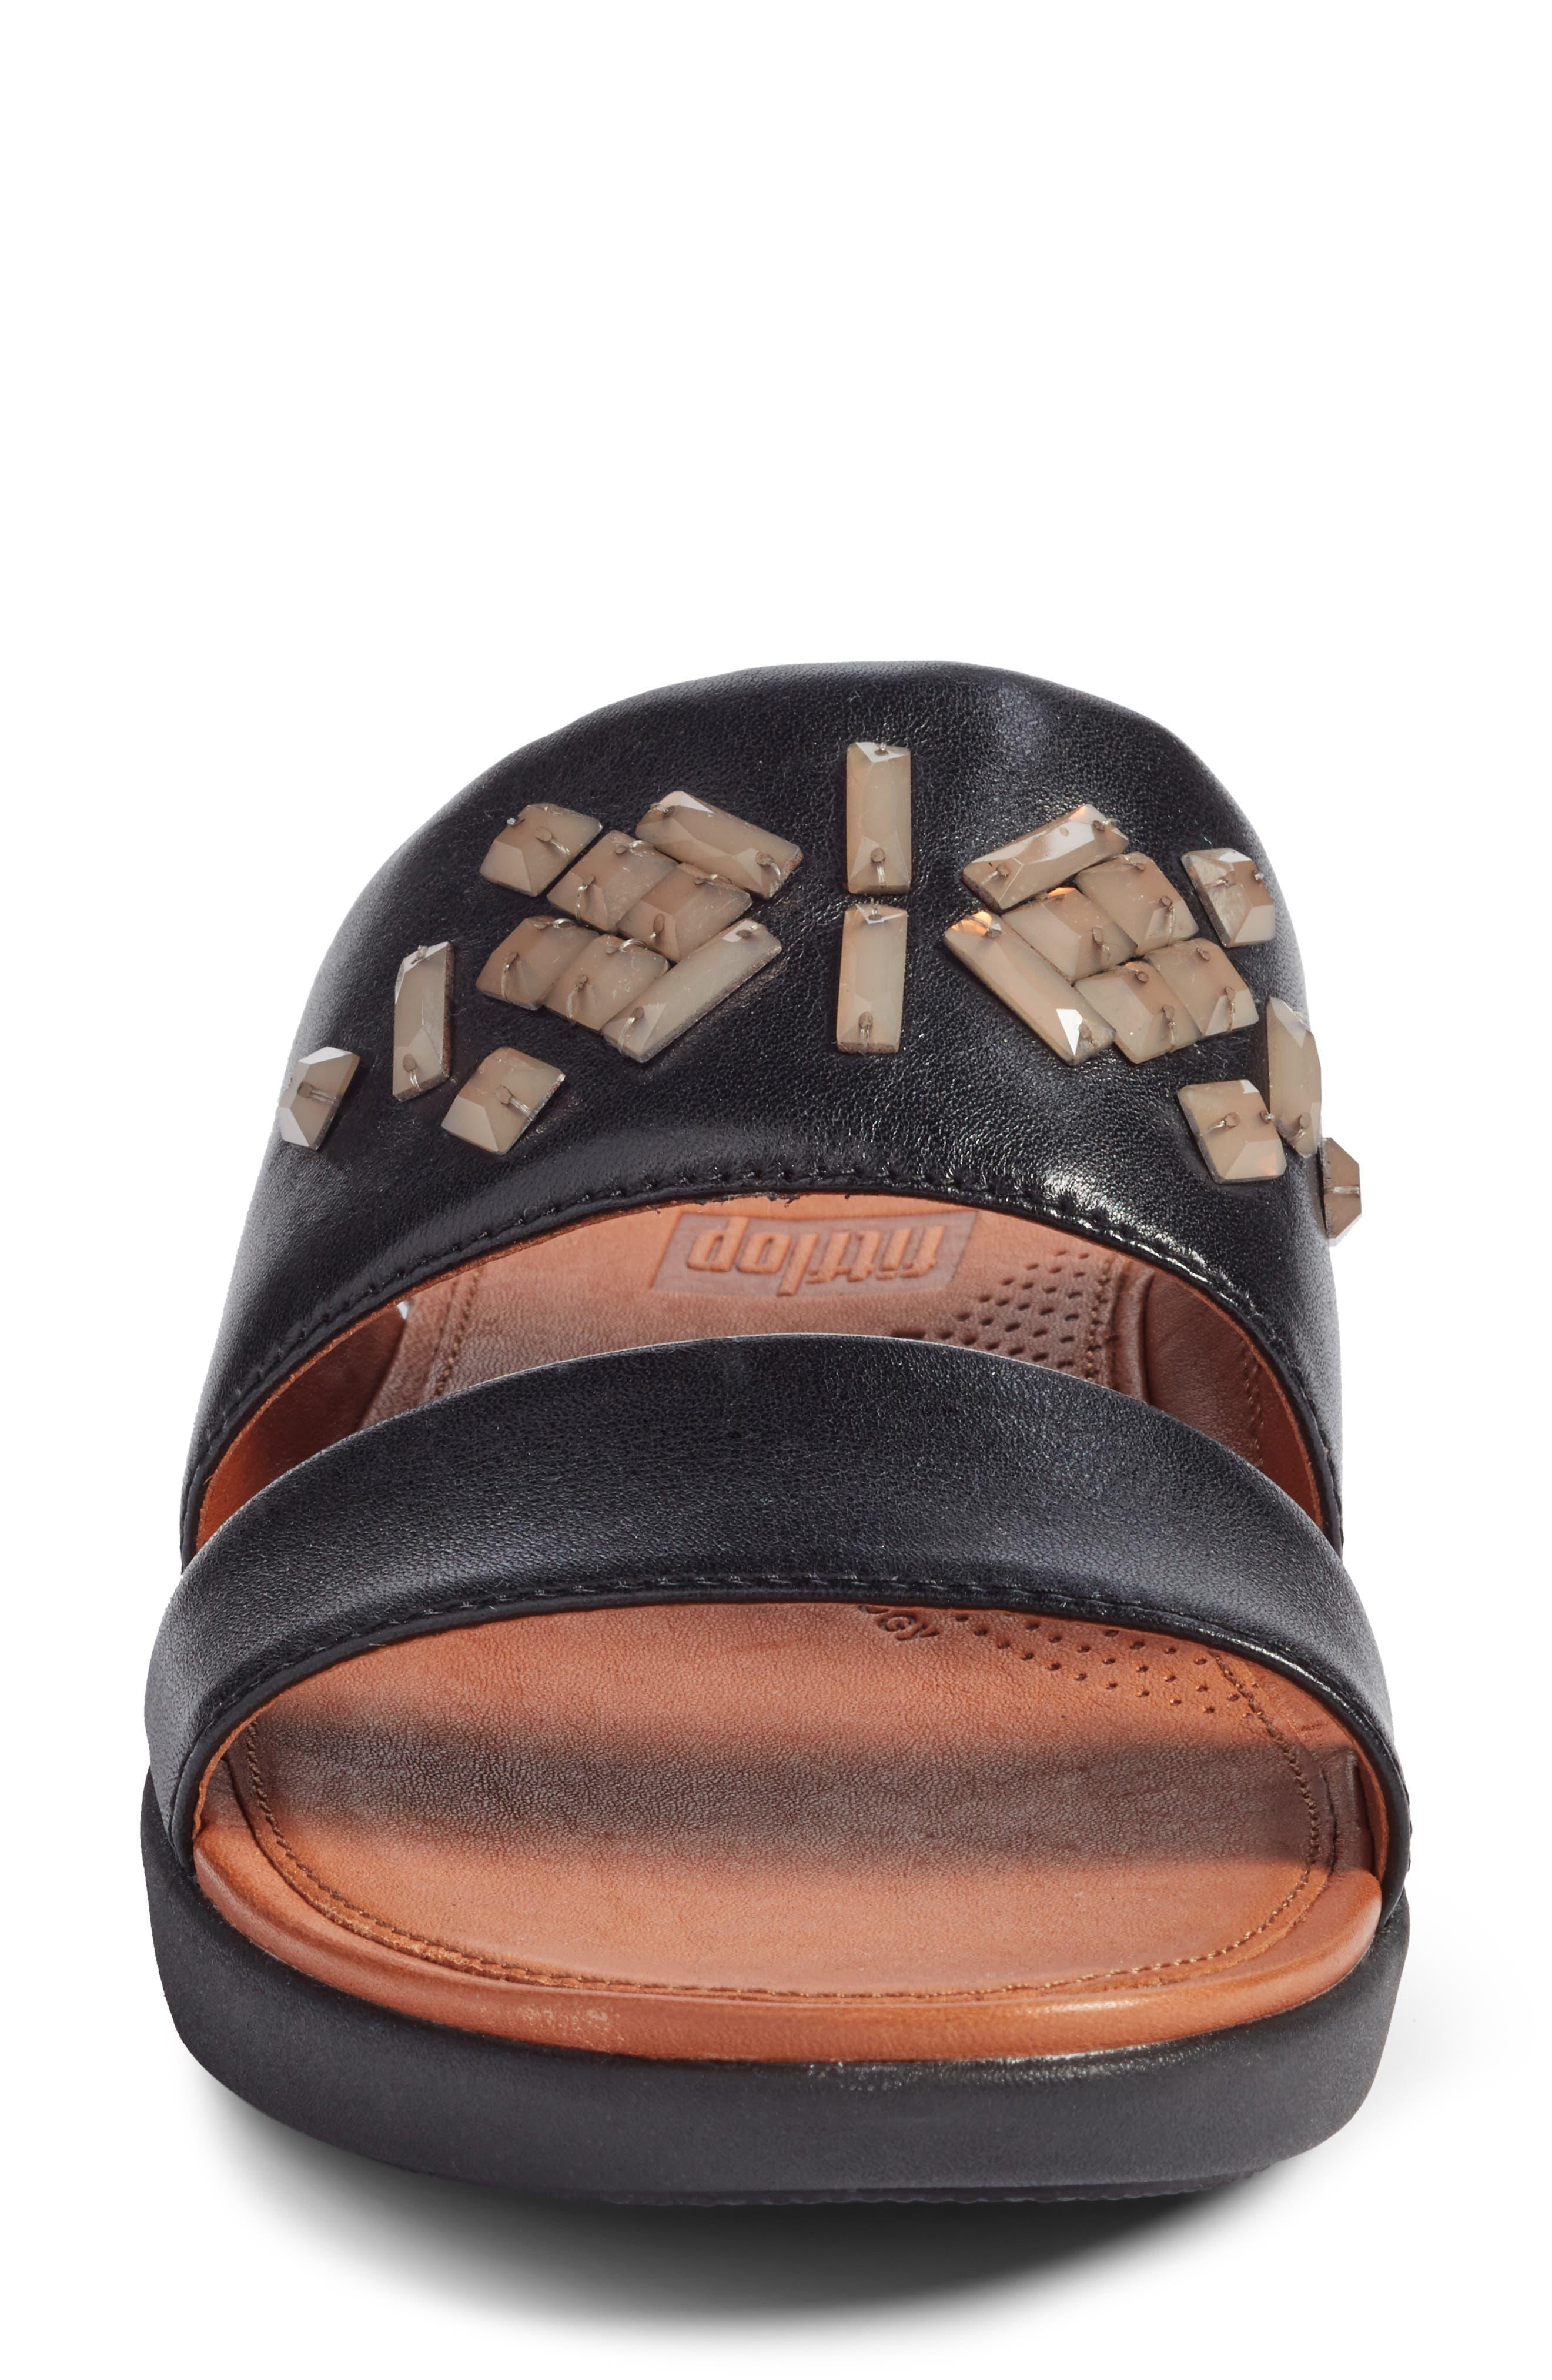 Delta Slide Sandal,                             Alternate thumbnail 4, color,                             BLACK LEATHER